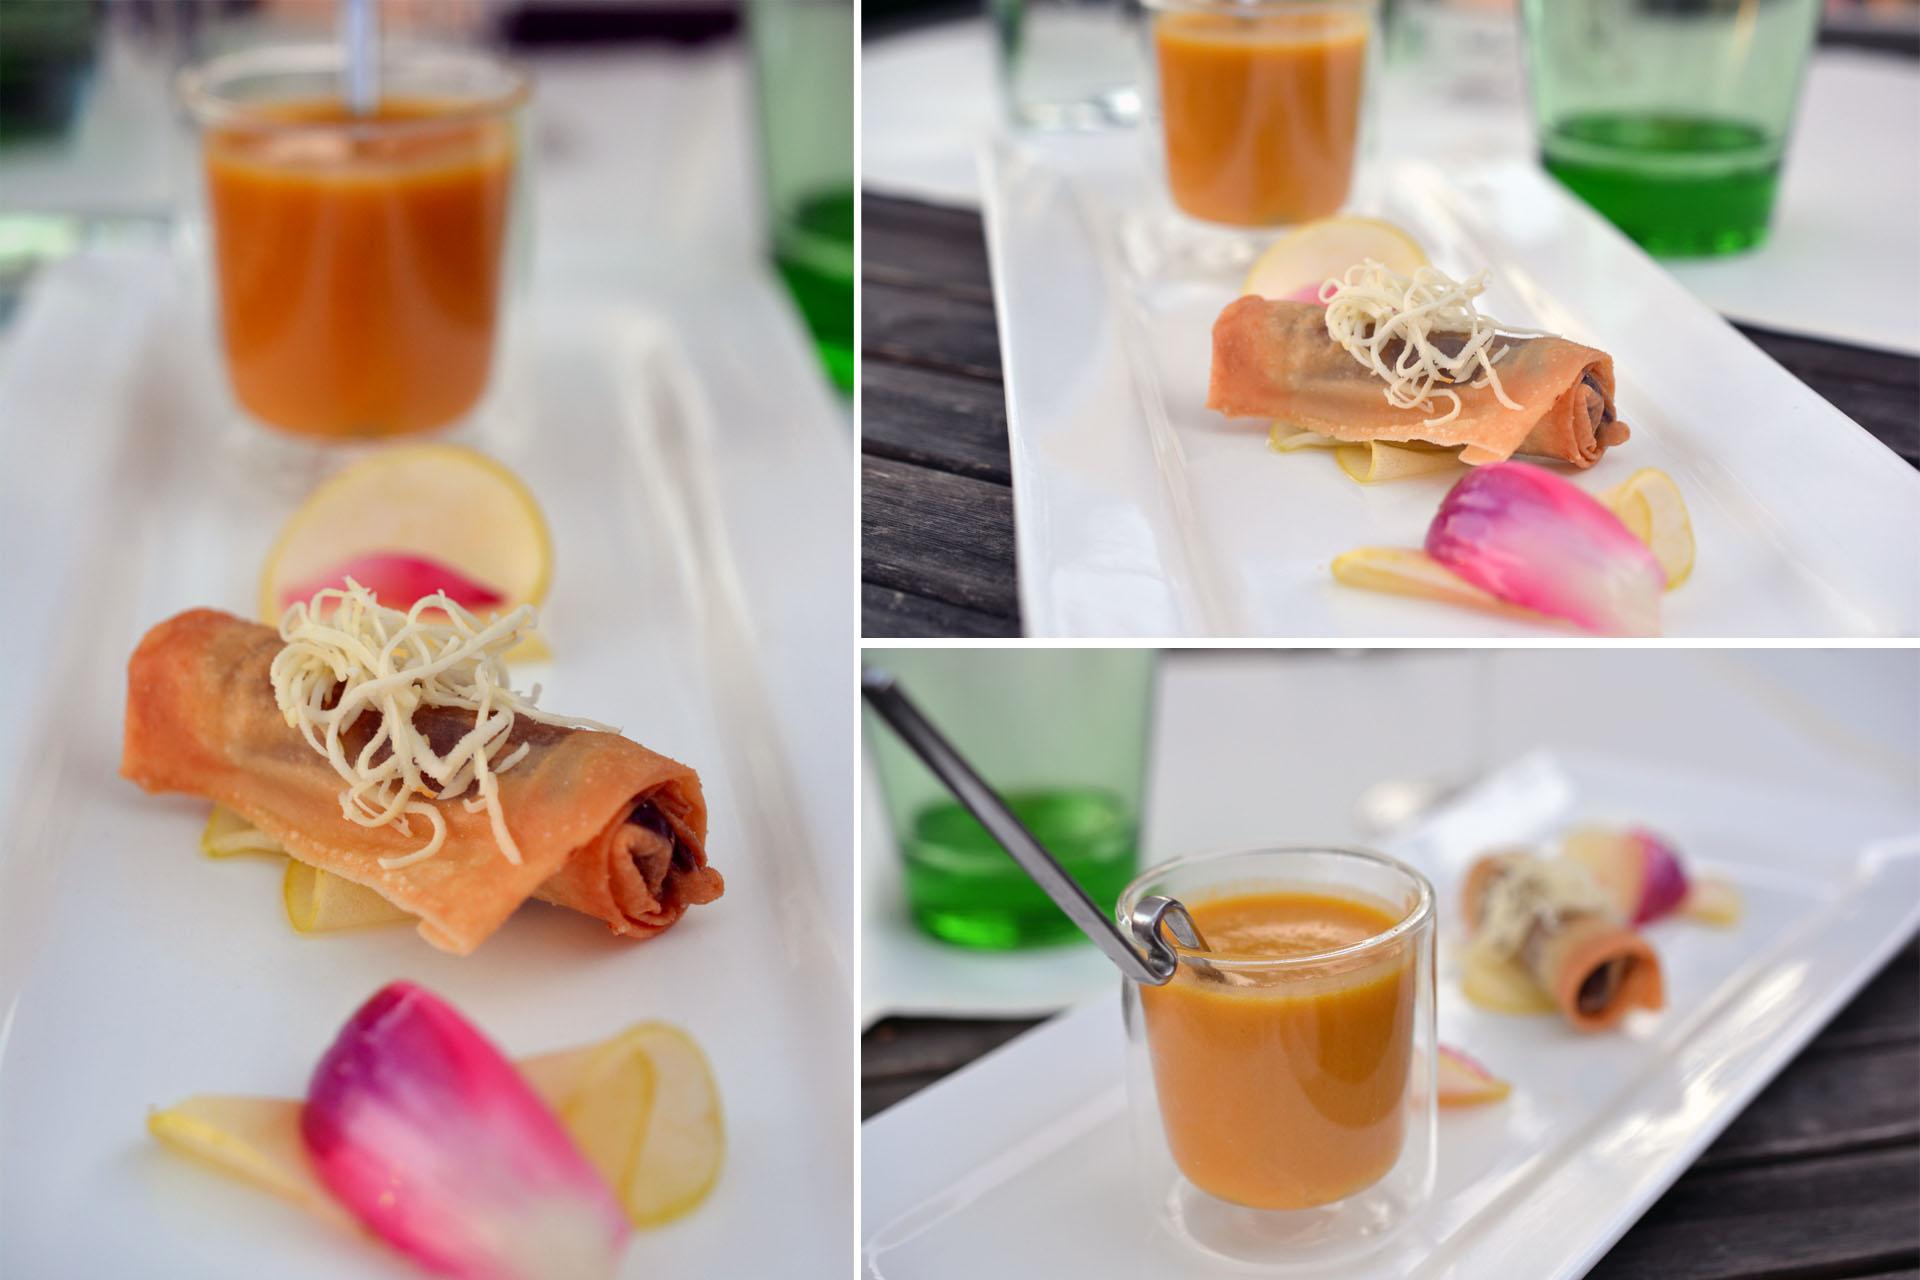 Kürbis-Apfelsuppe mit Blunz'n-Frühlingsrolle